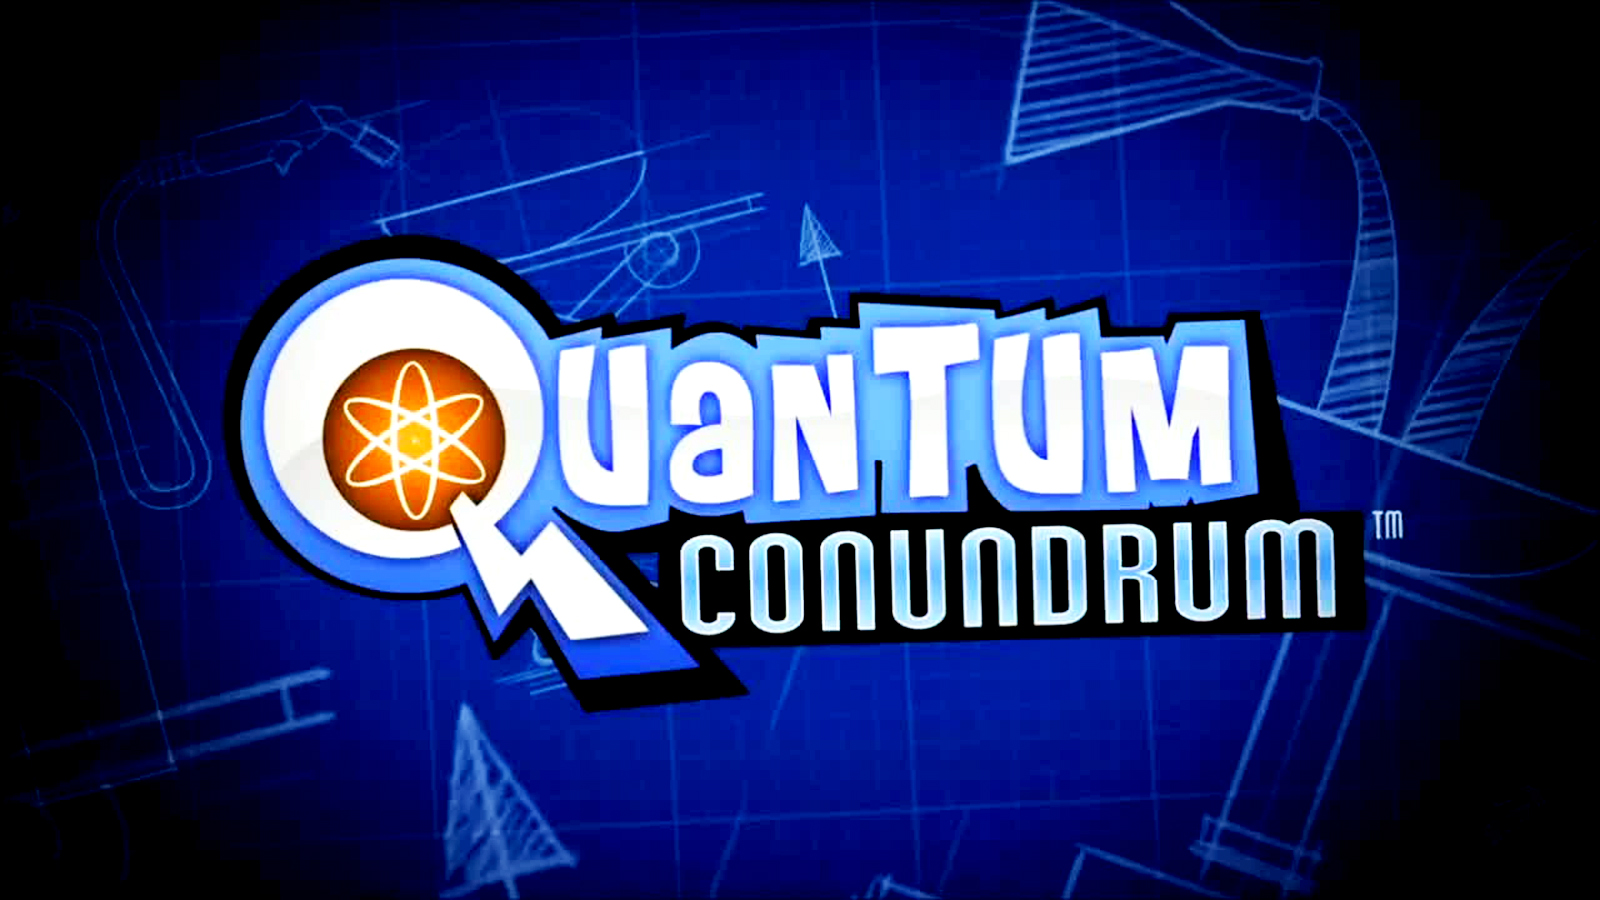 Quantum_Conundrum_Game_Logo_HD_Wallpaper.jpg